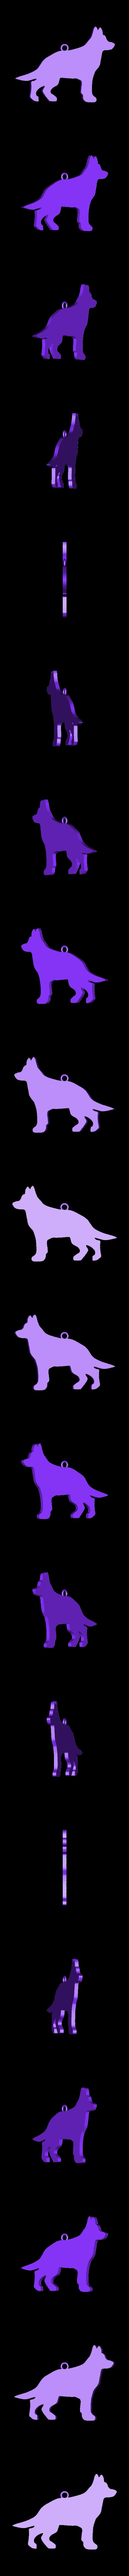 26.stl Download STL file Dogs • 3D printing object, GENNADI3313